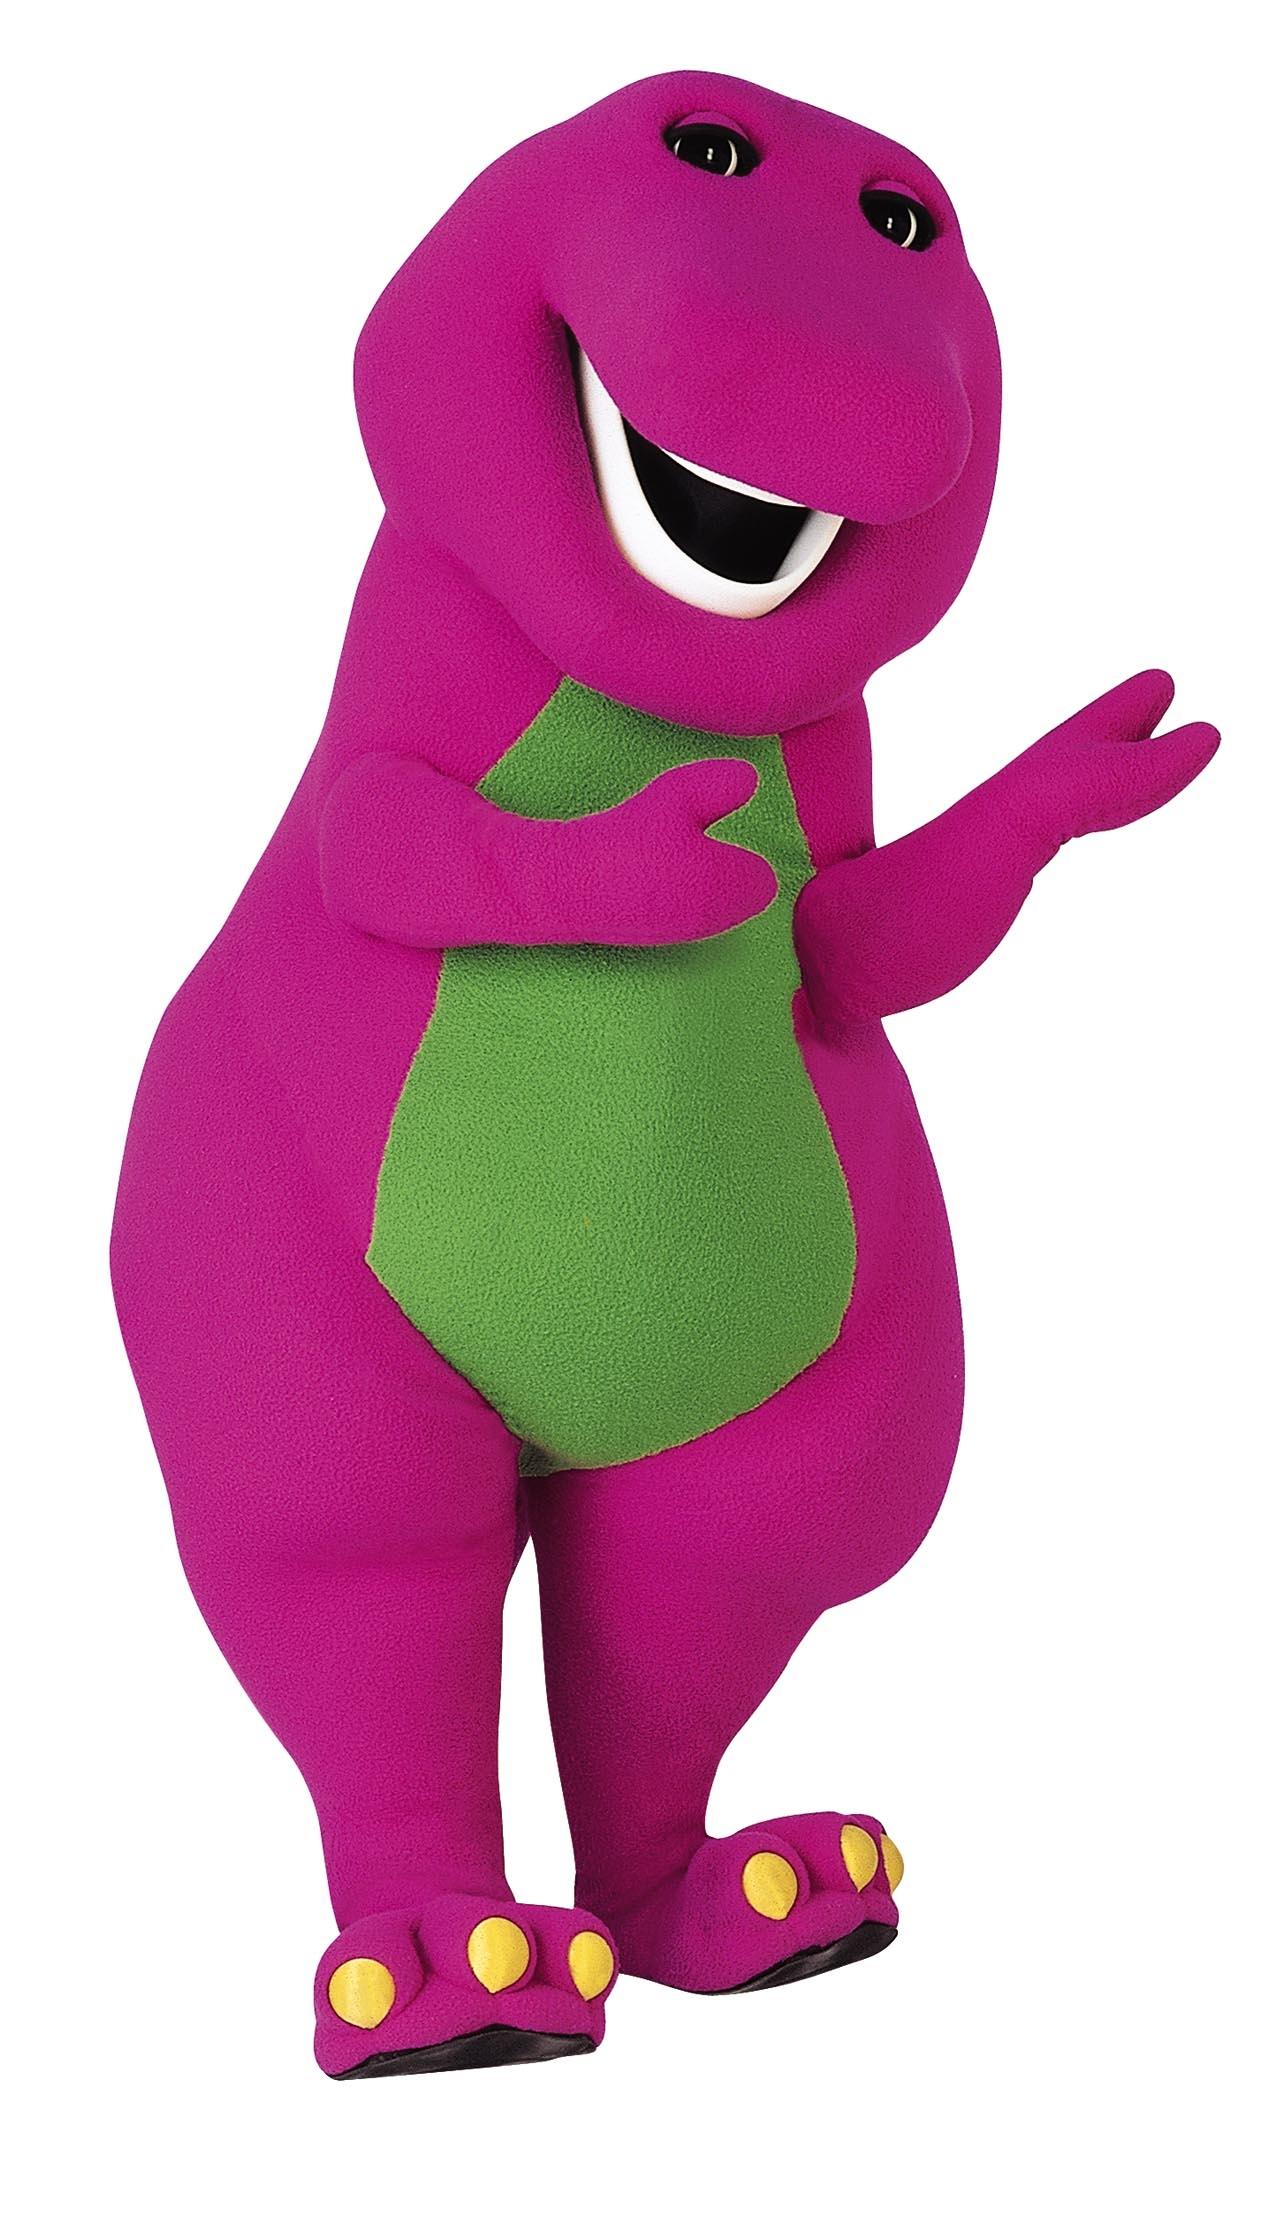 Barney The Dinosaur Heroes Wiki FANDOM Powered By Wikia